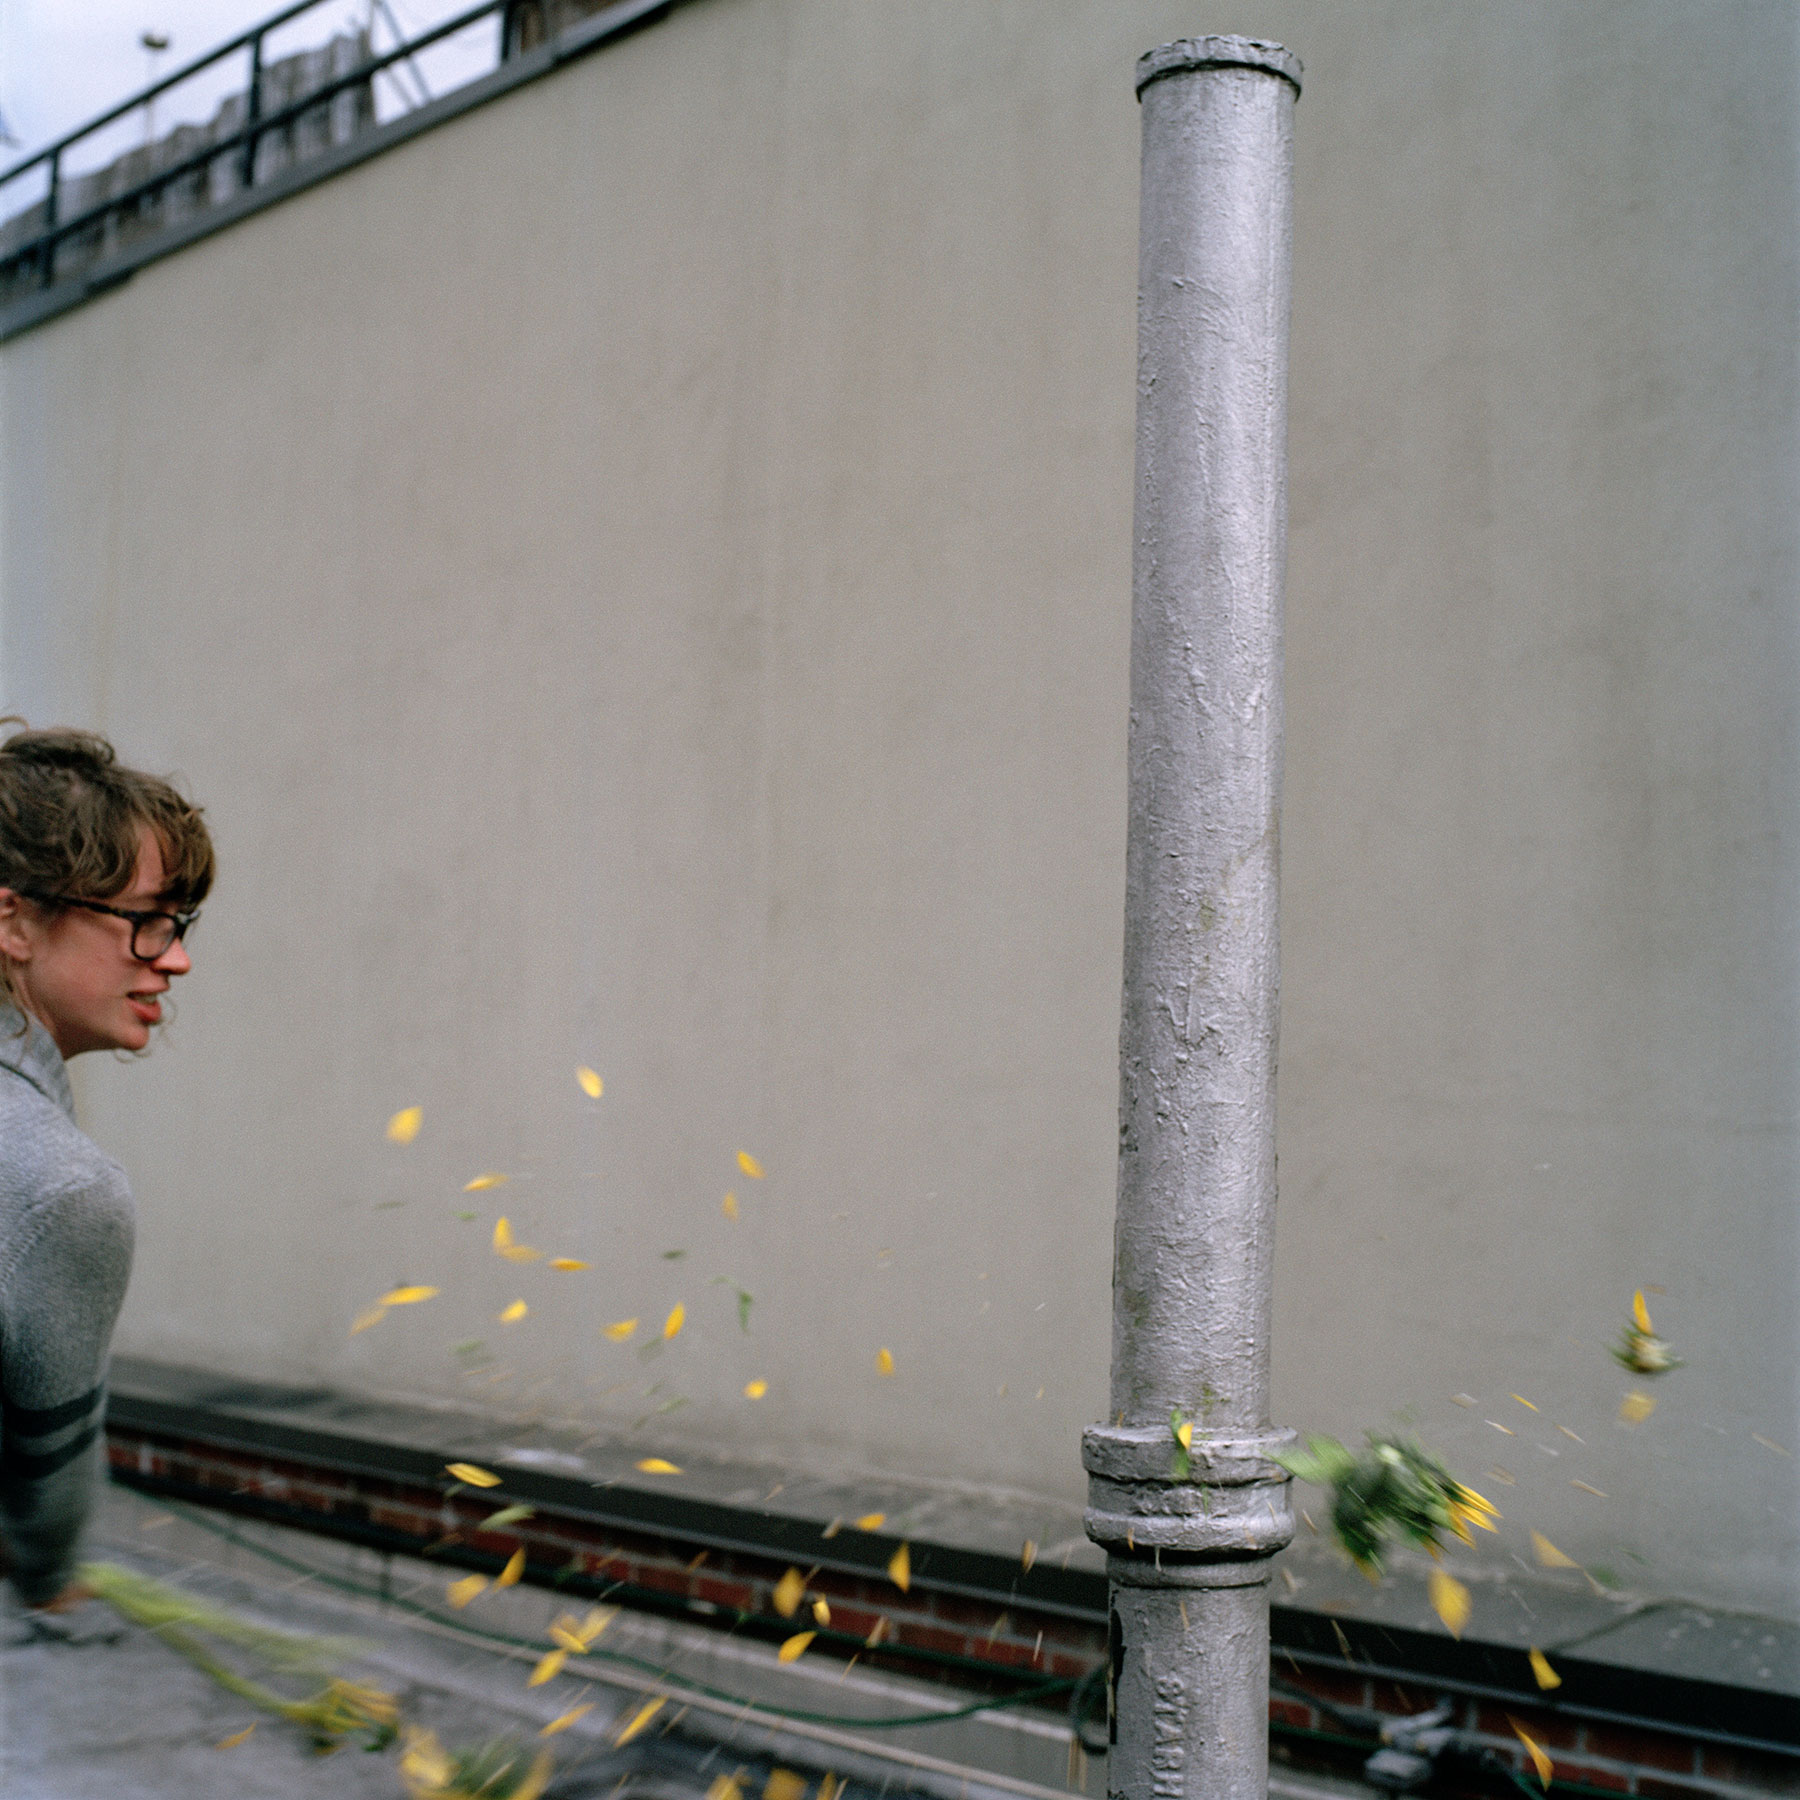 sunflowers_03.jpg